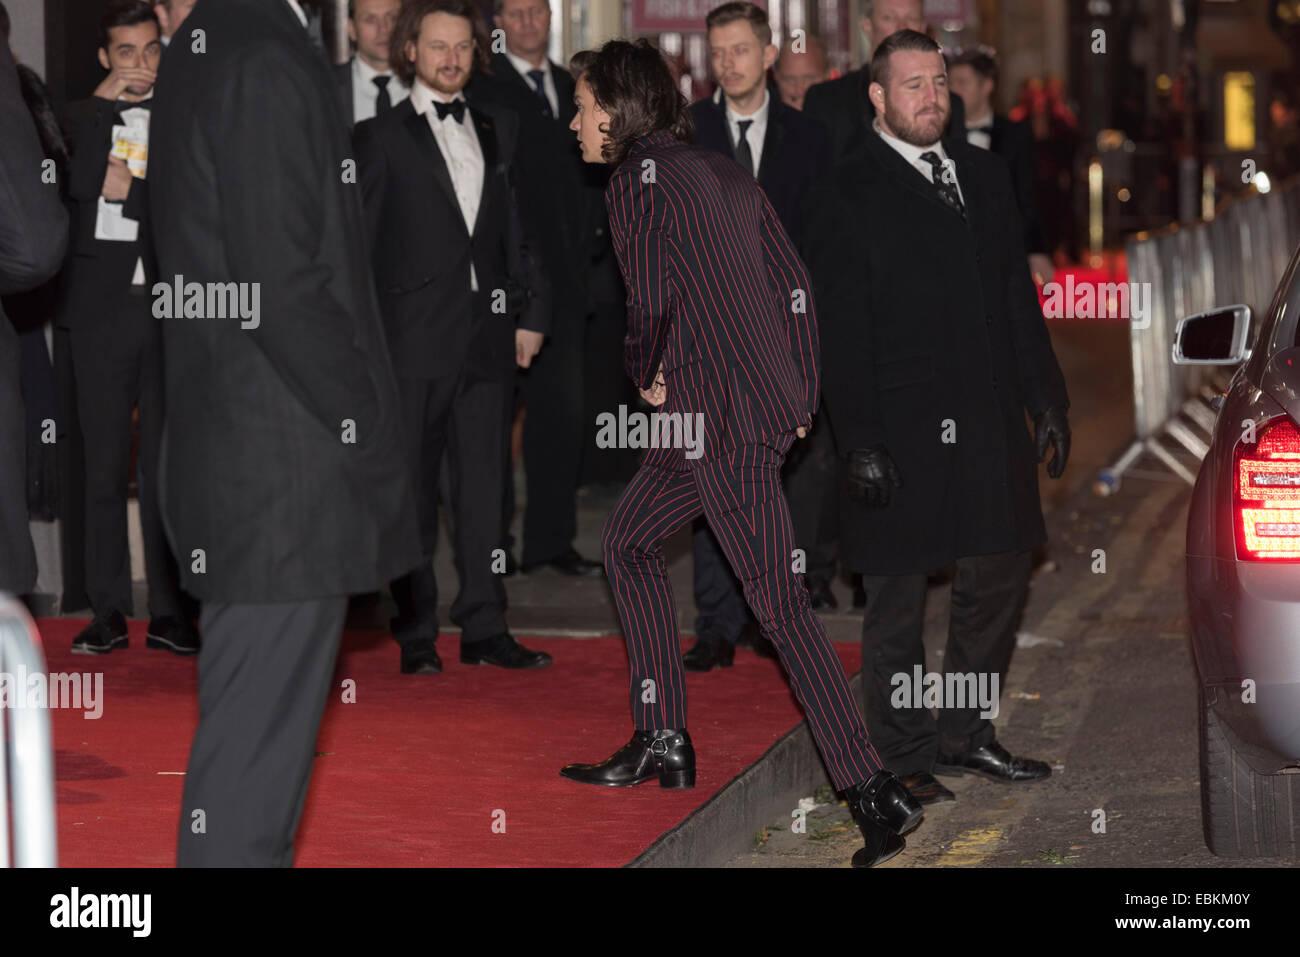 Harry Styles 2014 Stock Photos & Harry Styles 2014 Stock ...